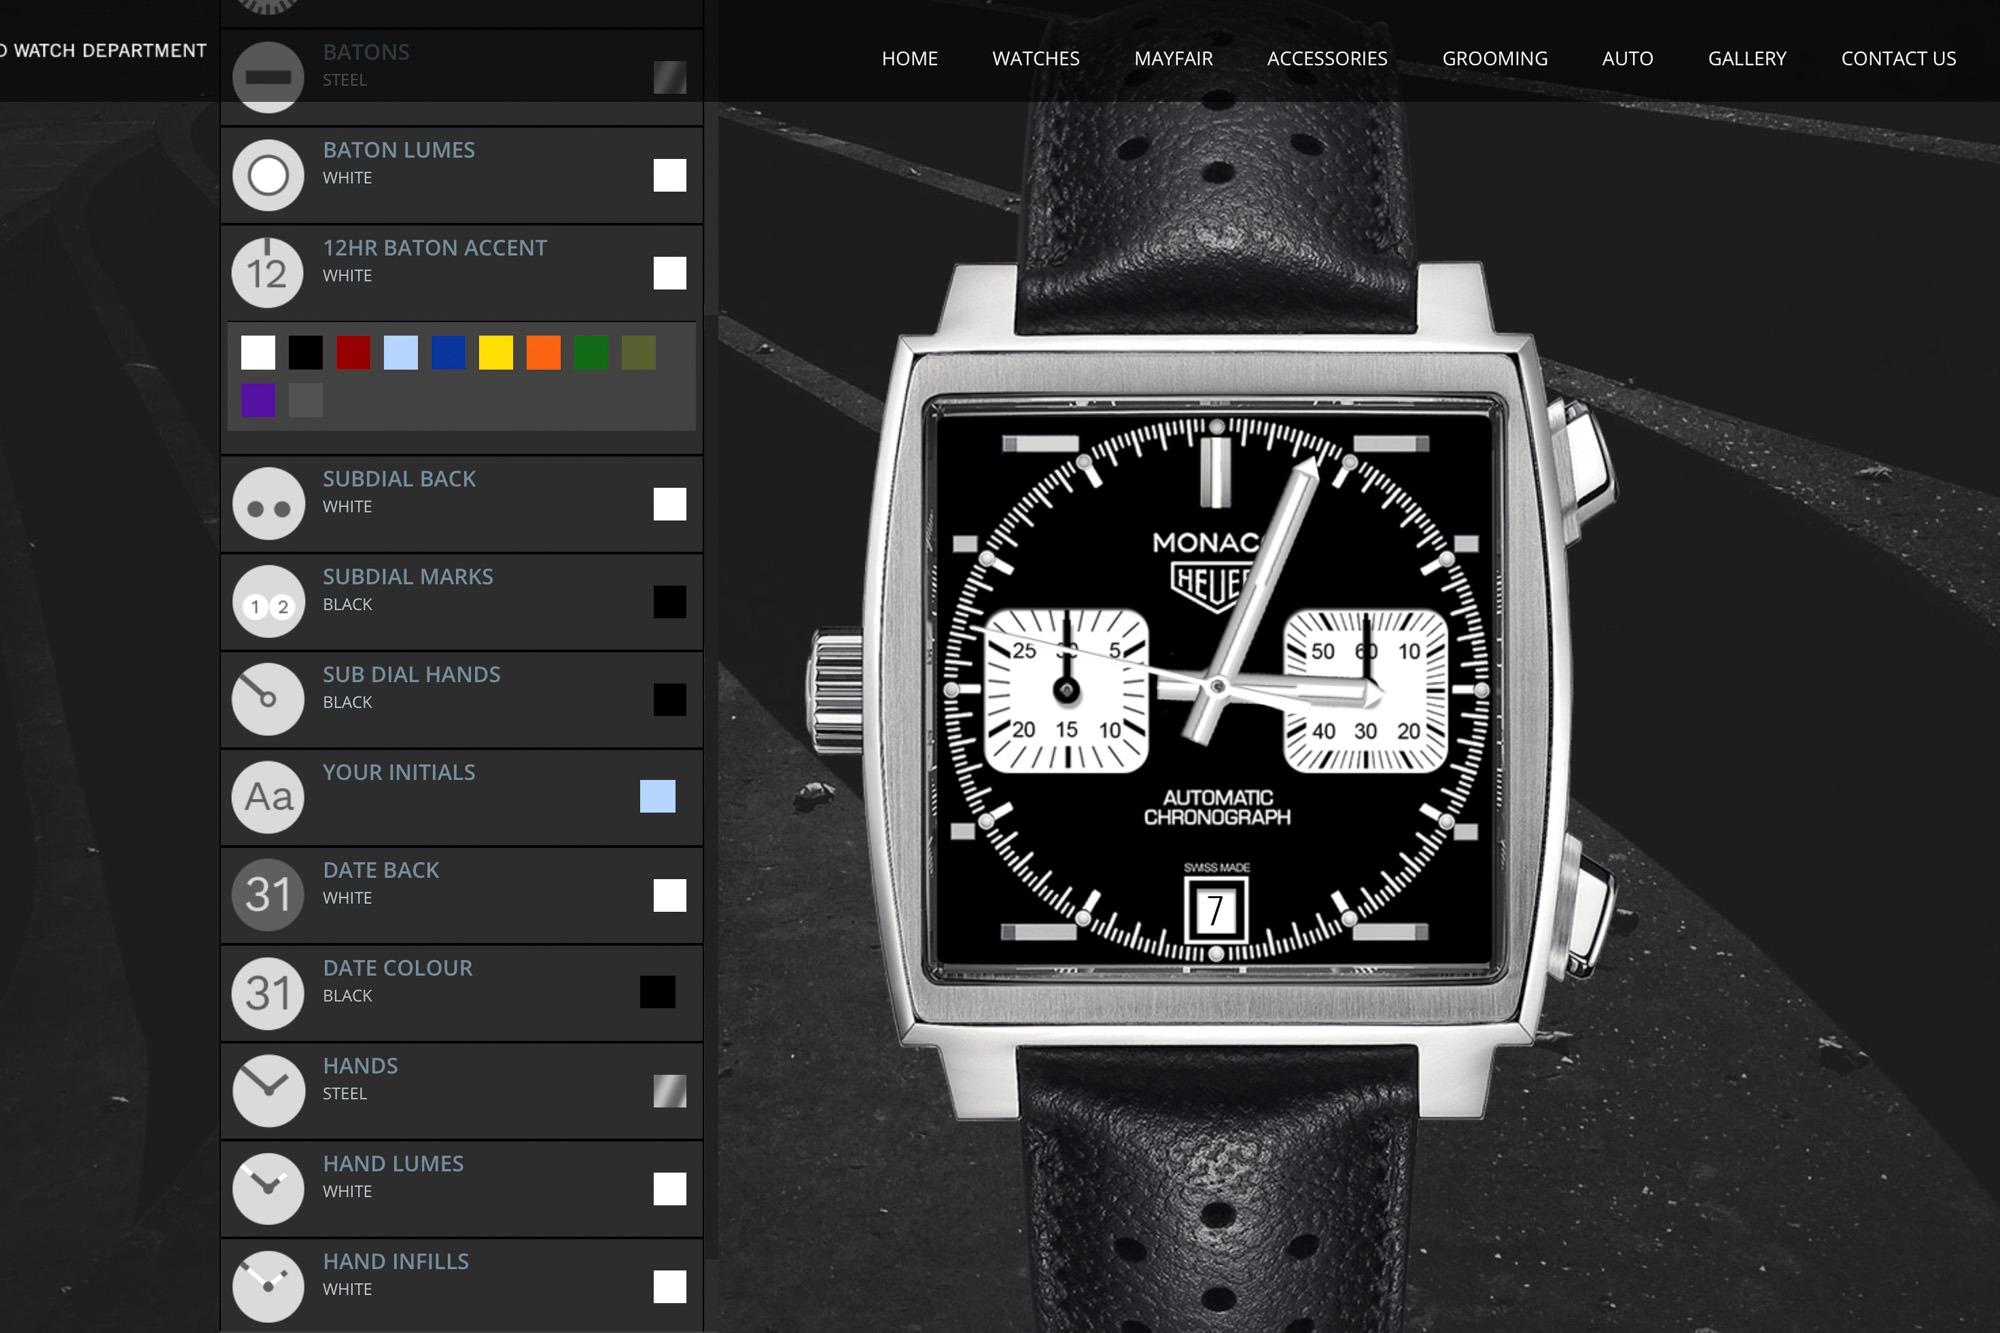 Tag Heuer Monaco -Bamford - Personnalisation de montres BWD